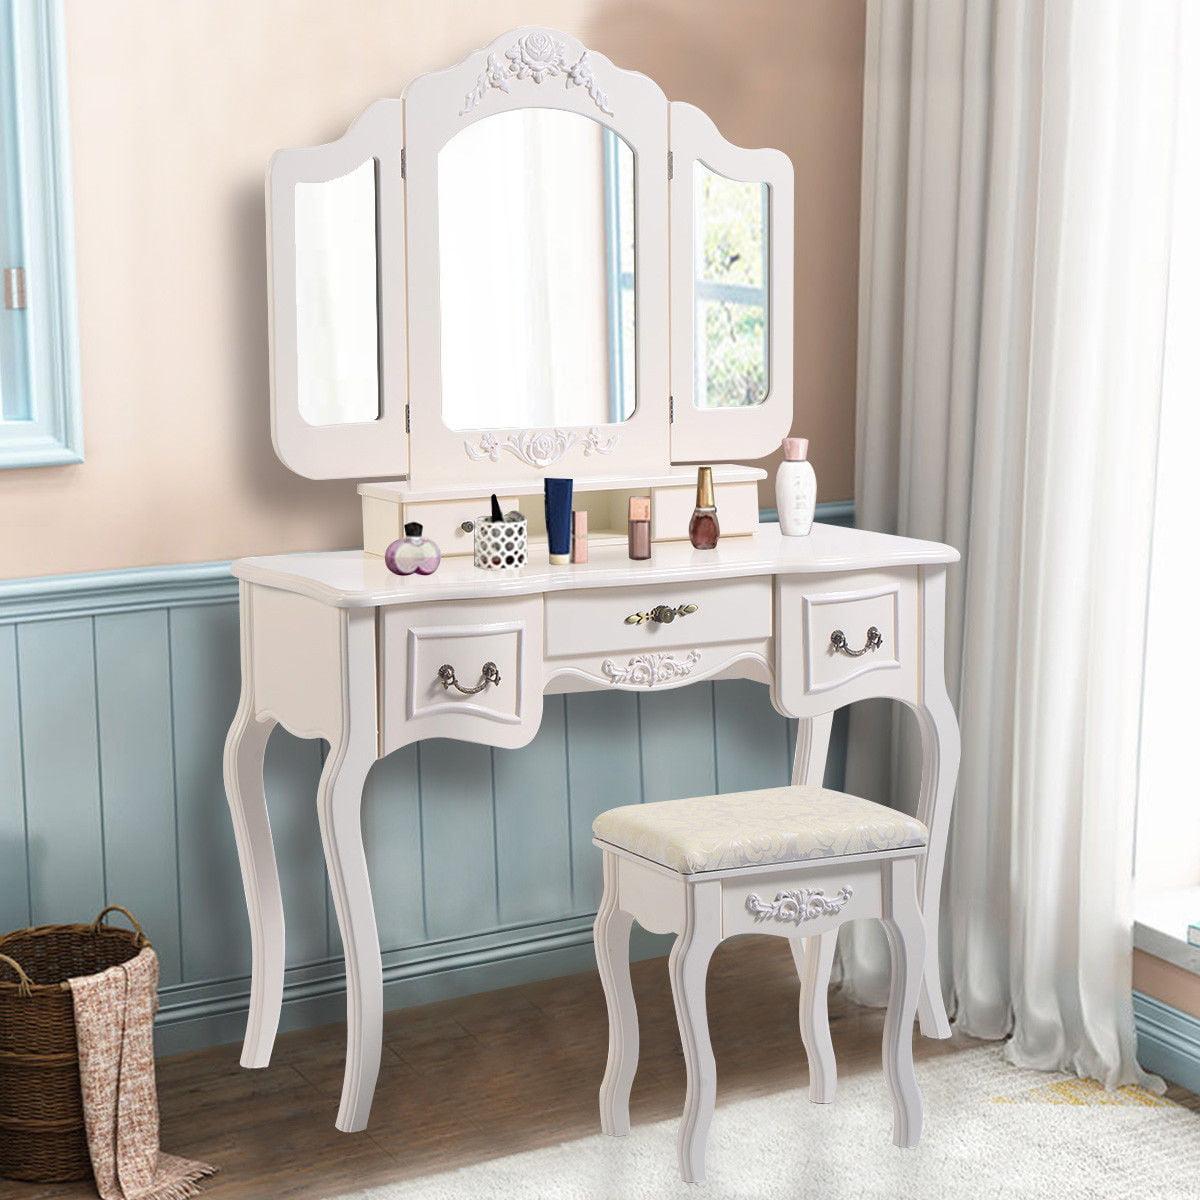 Click here to buy Costway Tri Folding Vintage White Vanity Makeup Dressing Table Set bathroom 5 Drawers &stool by Costway.